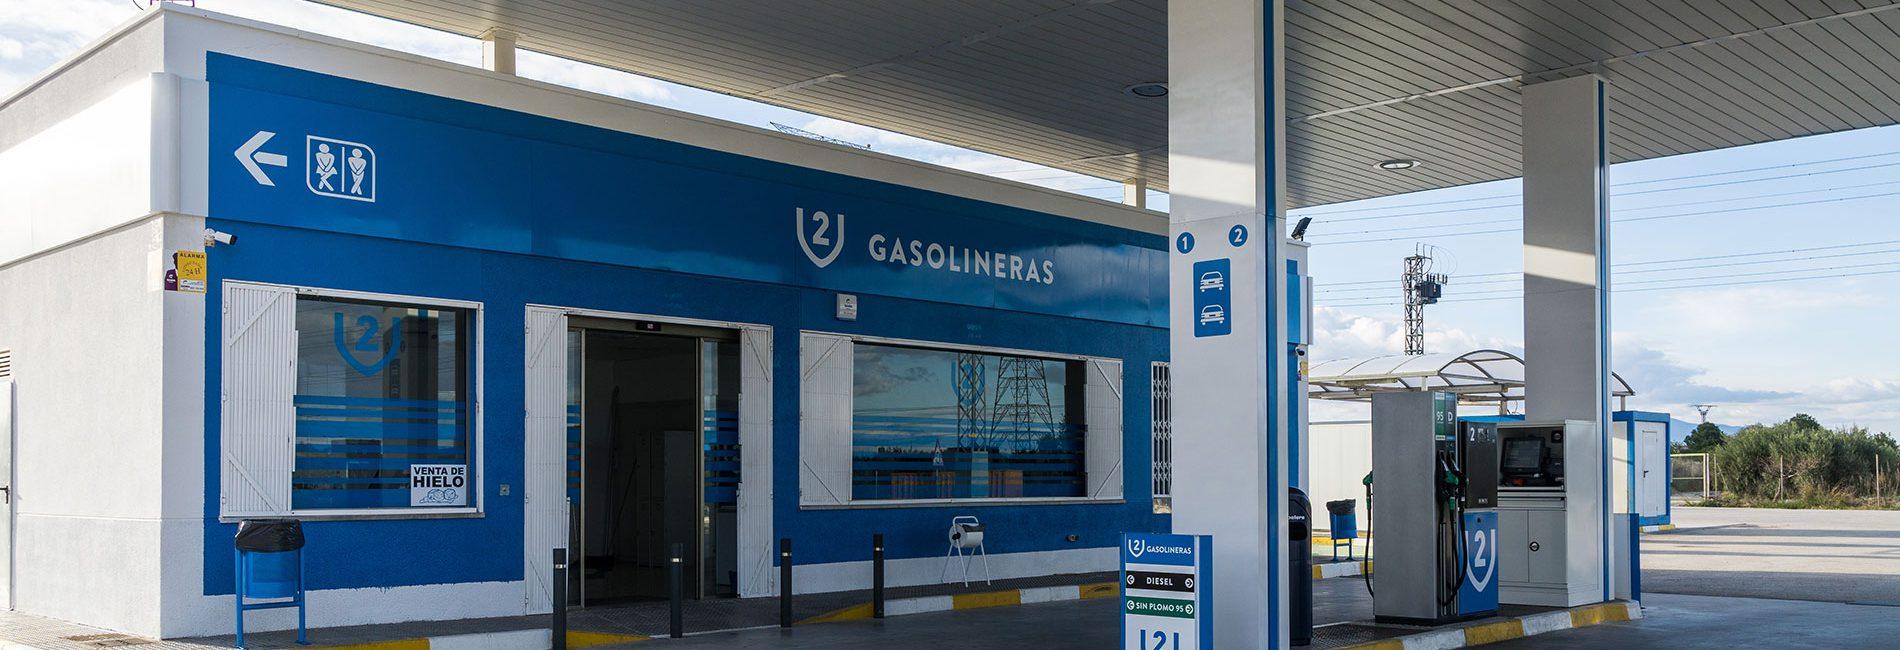 V2 Gasolineras Sangonera la Verde